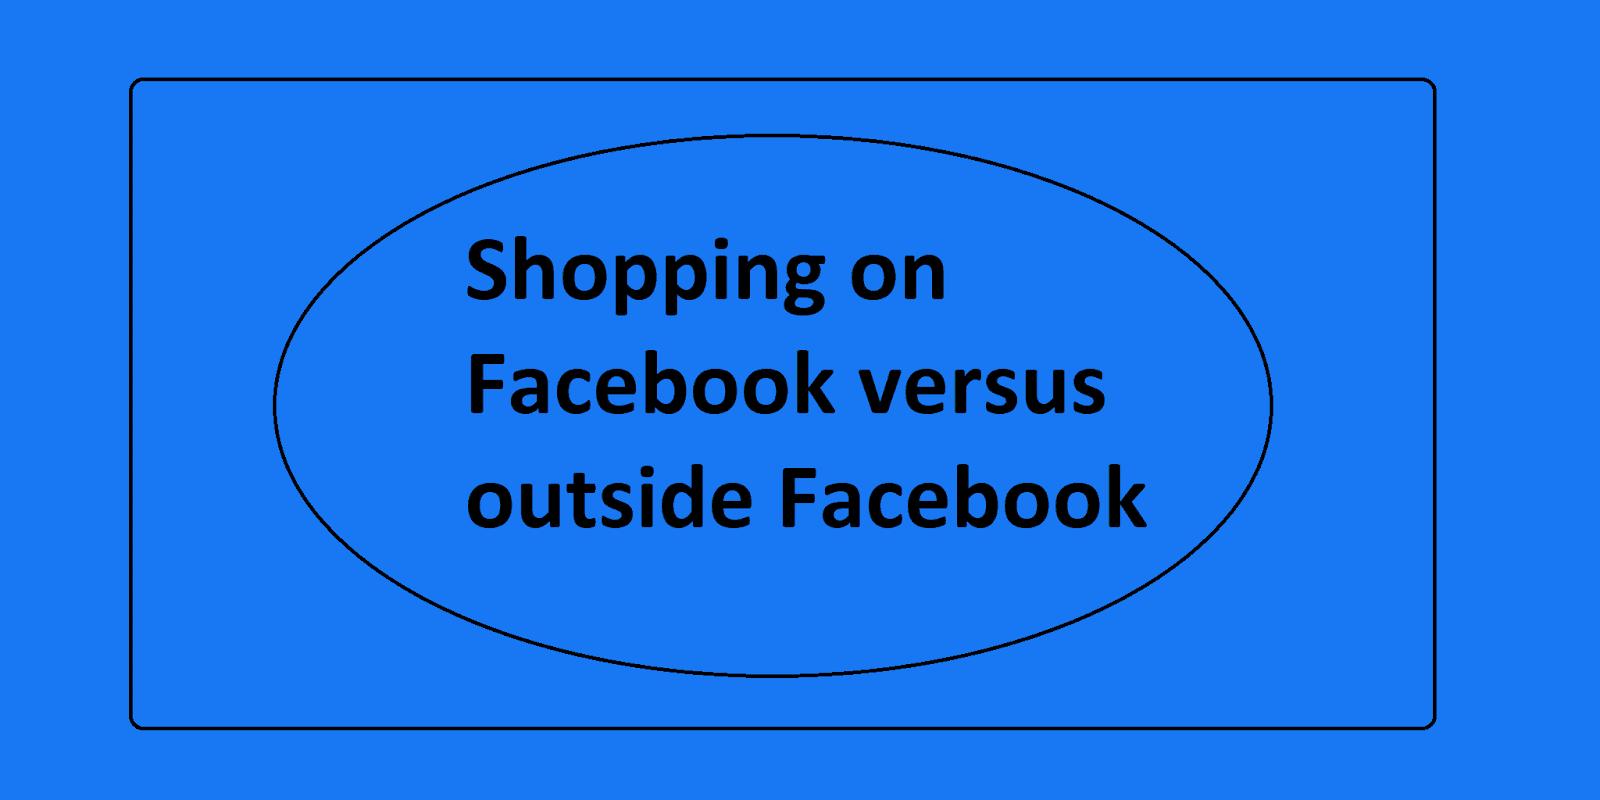 Shopping on Facebook versus outside Facebook